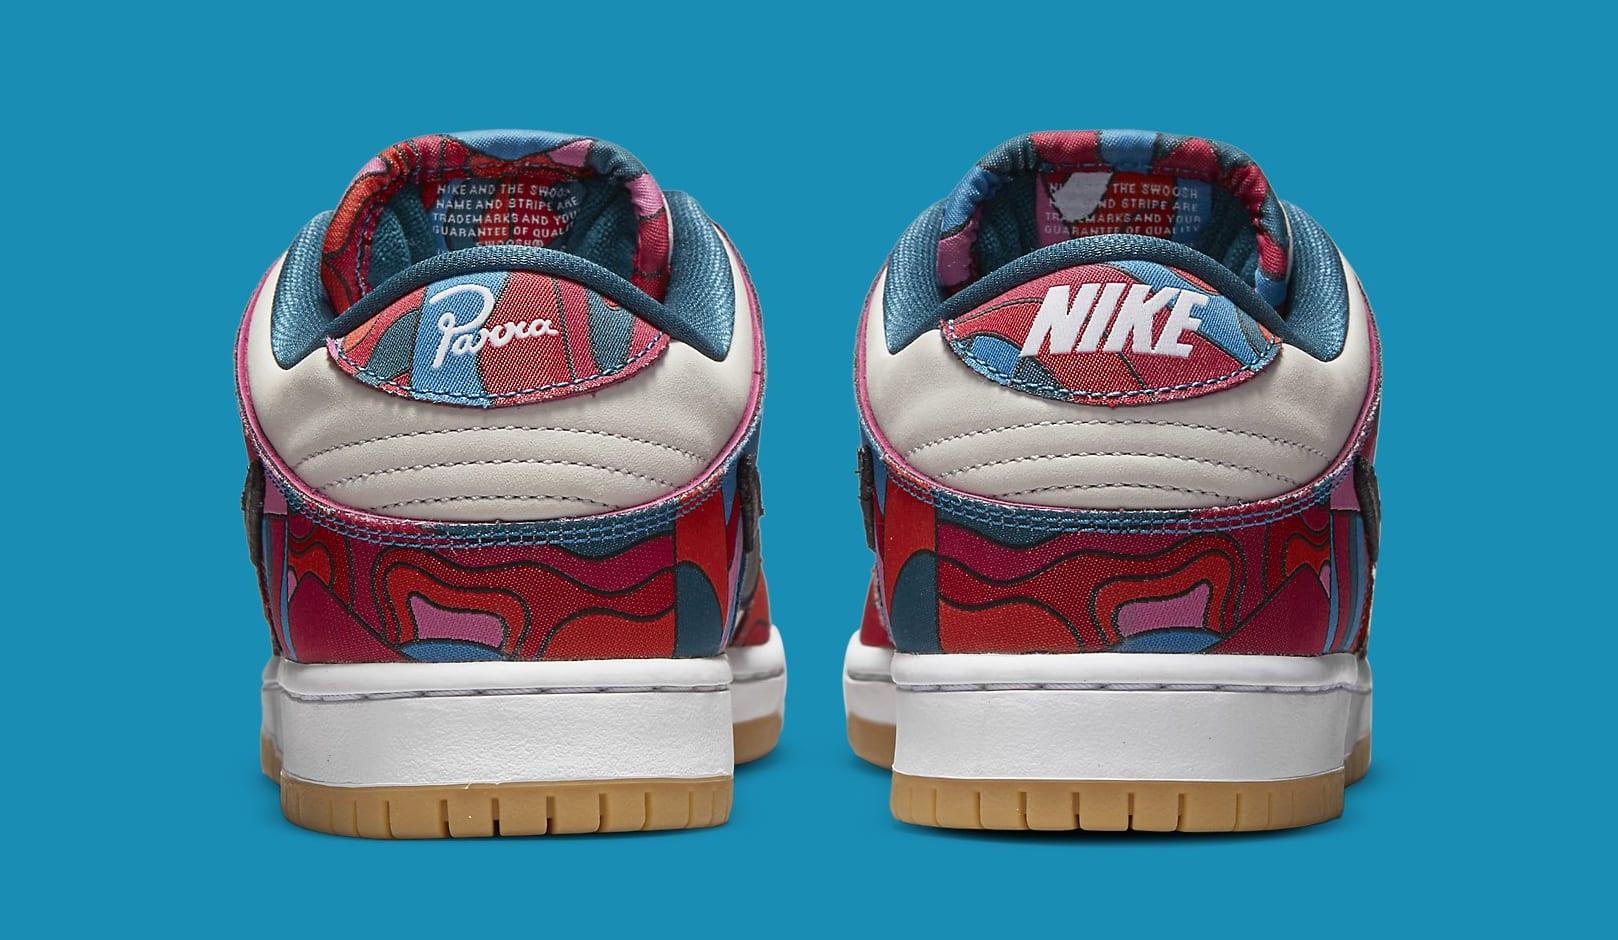 Parra x Nike SB Dunk Low DH7695-600 Heel